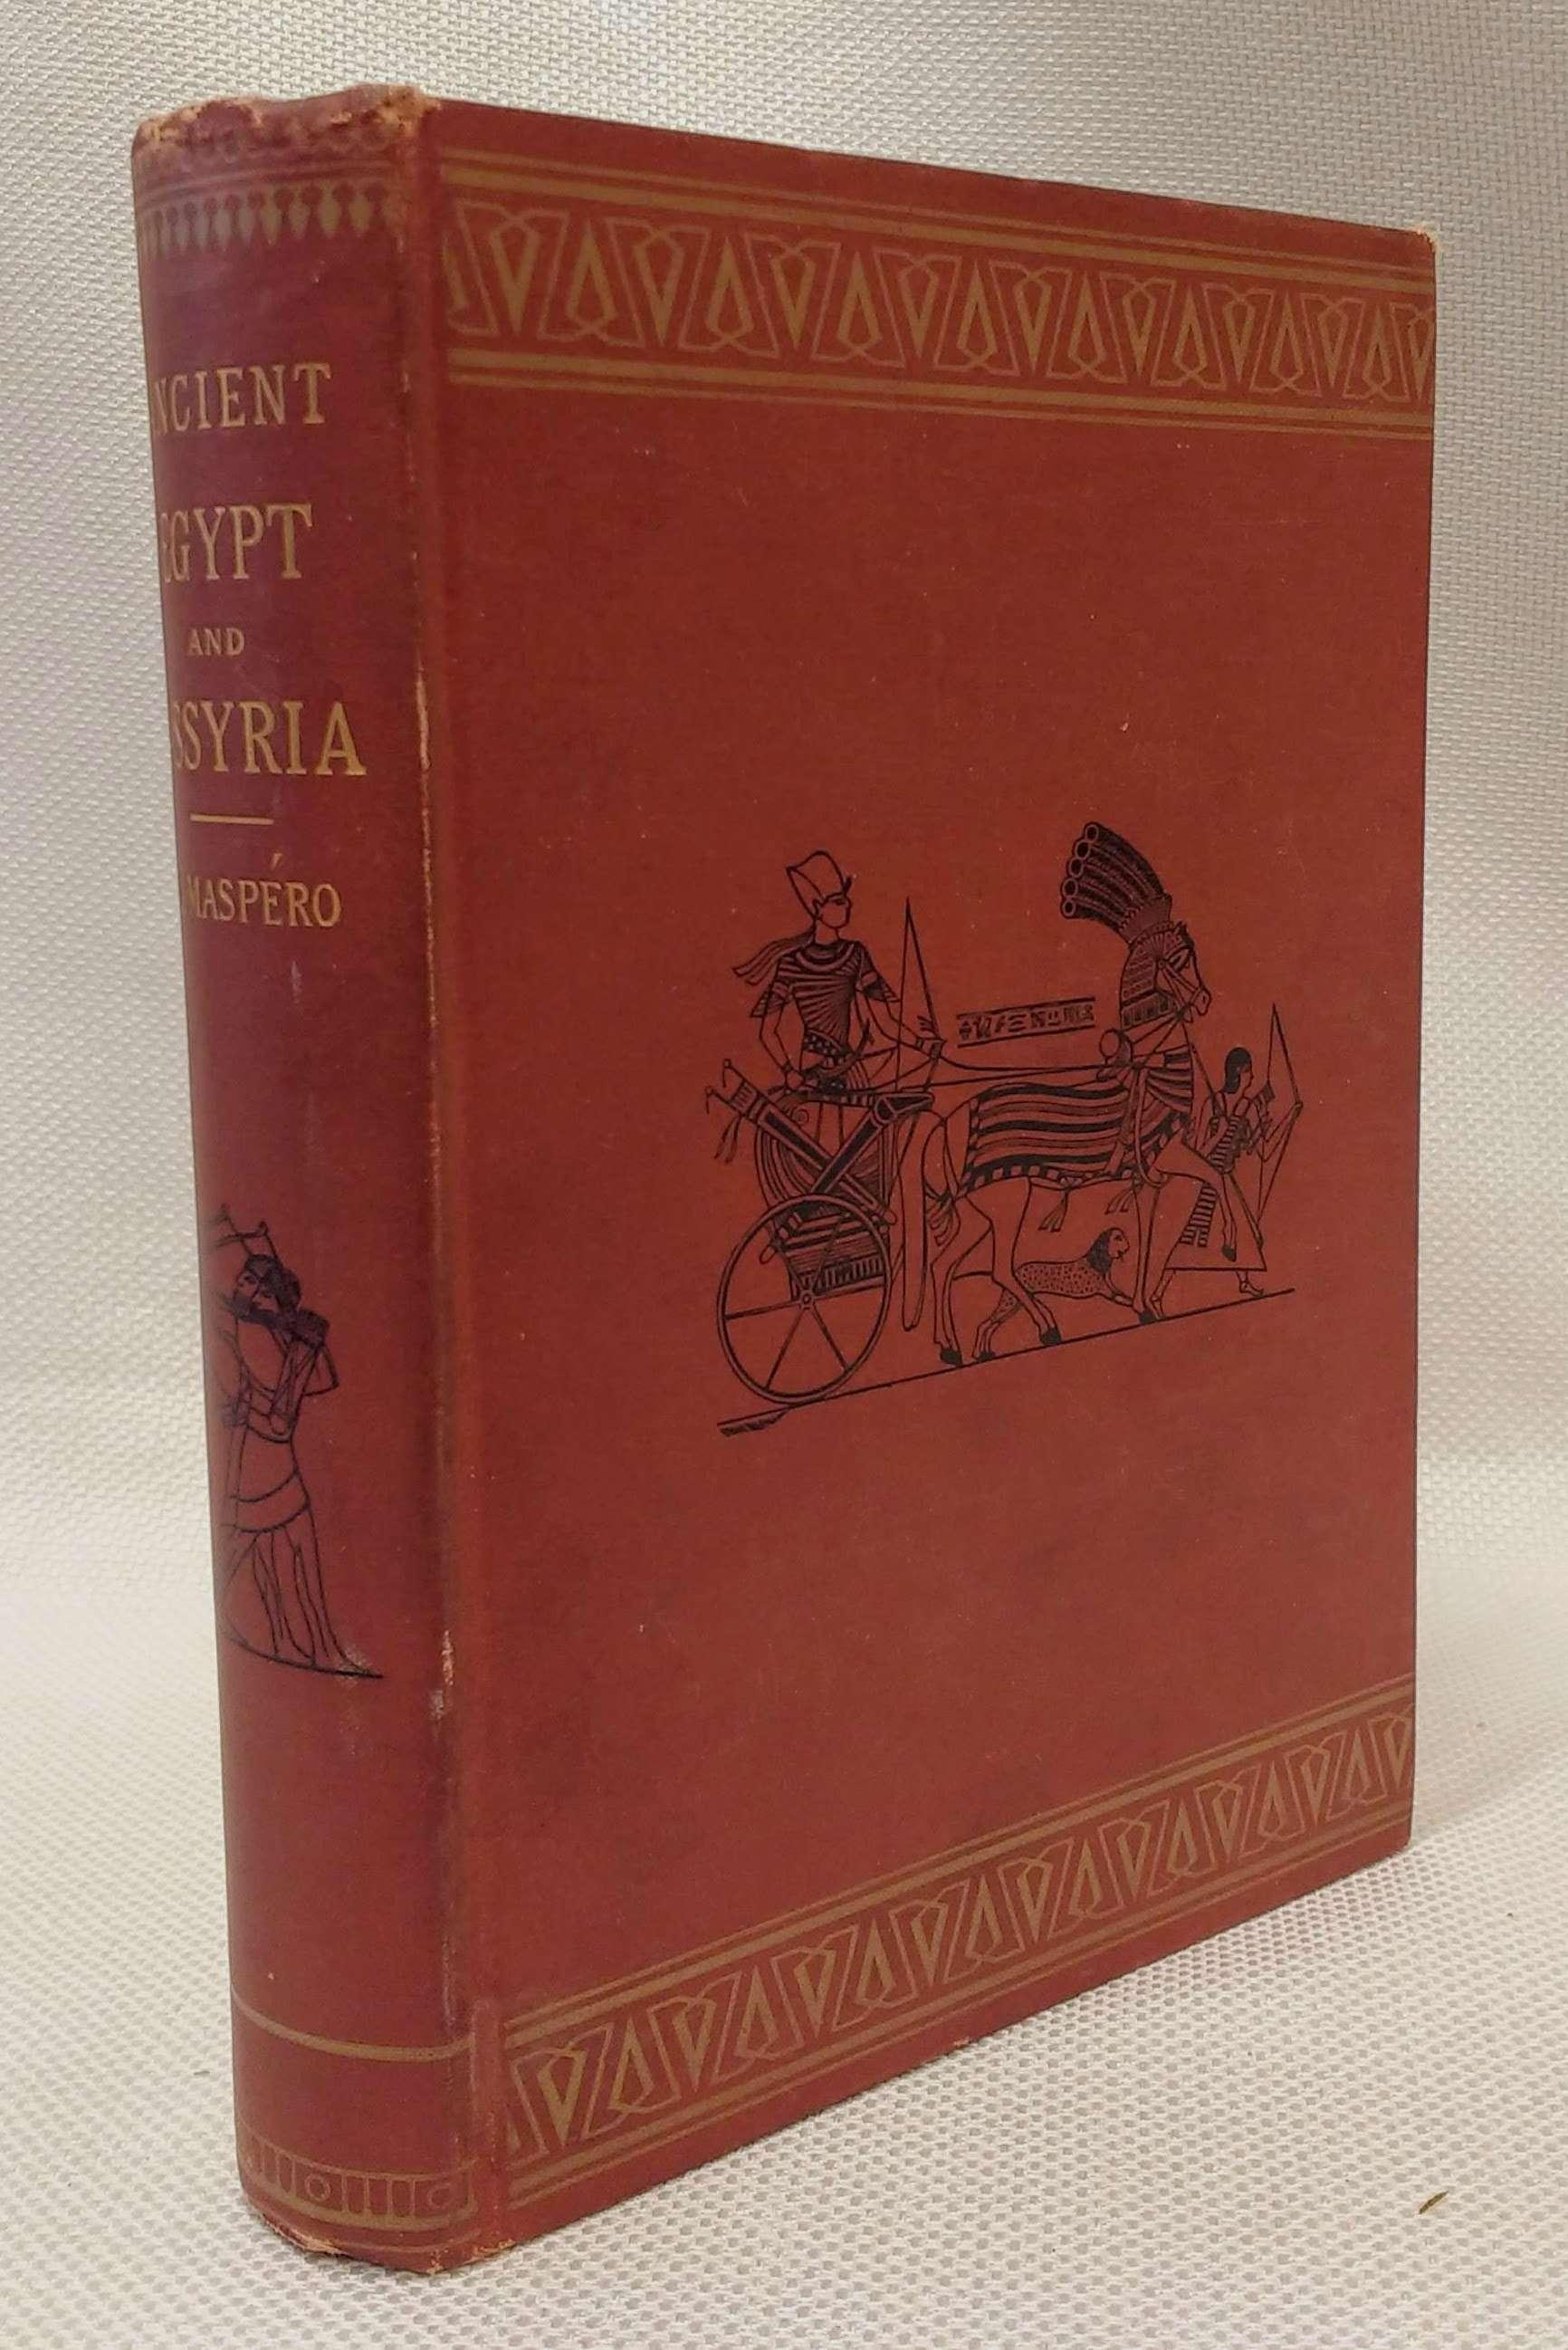 Life in ancient Egypt and Assyria, Maspero, G. [Gaston]